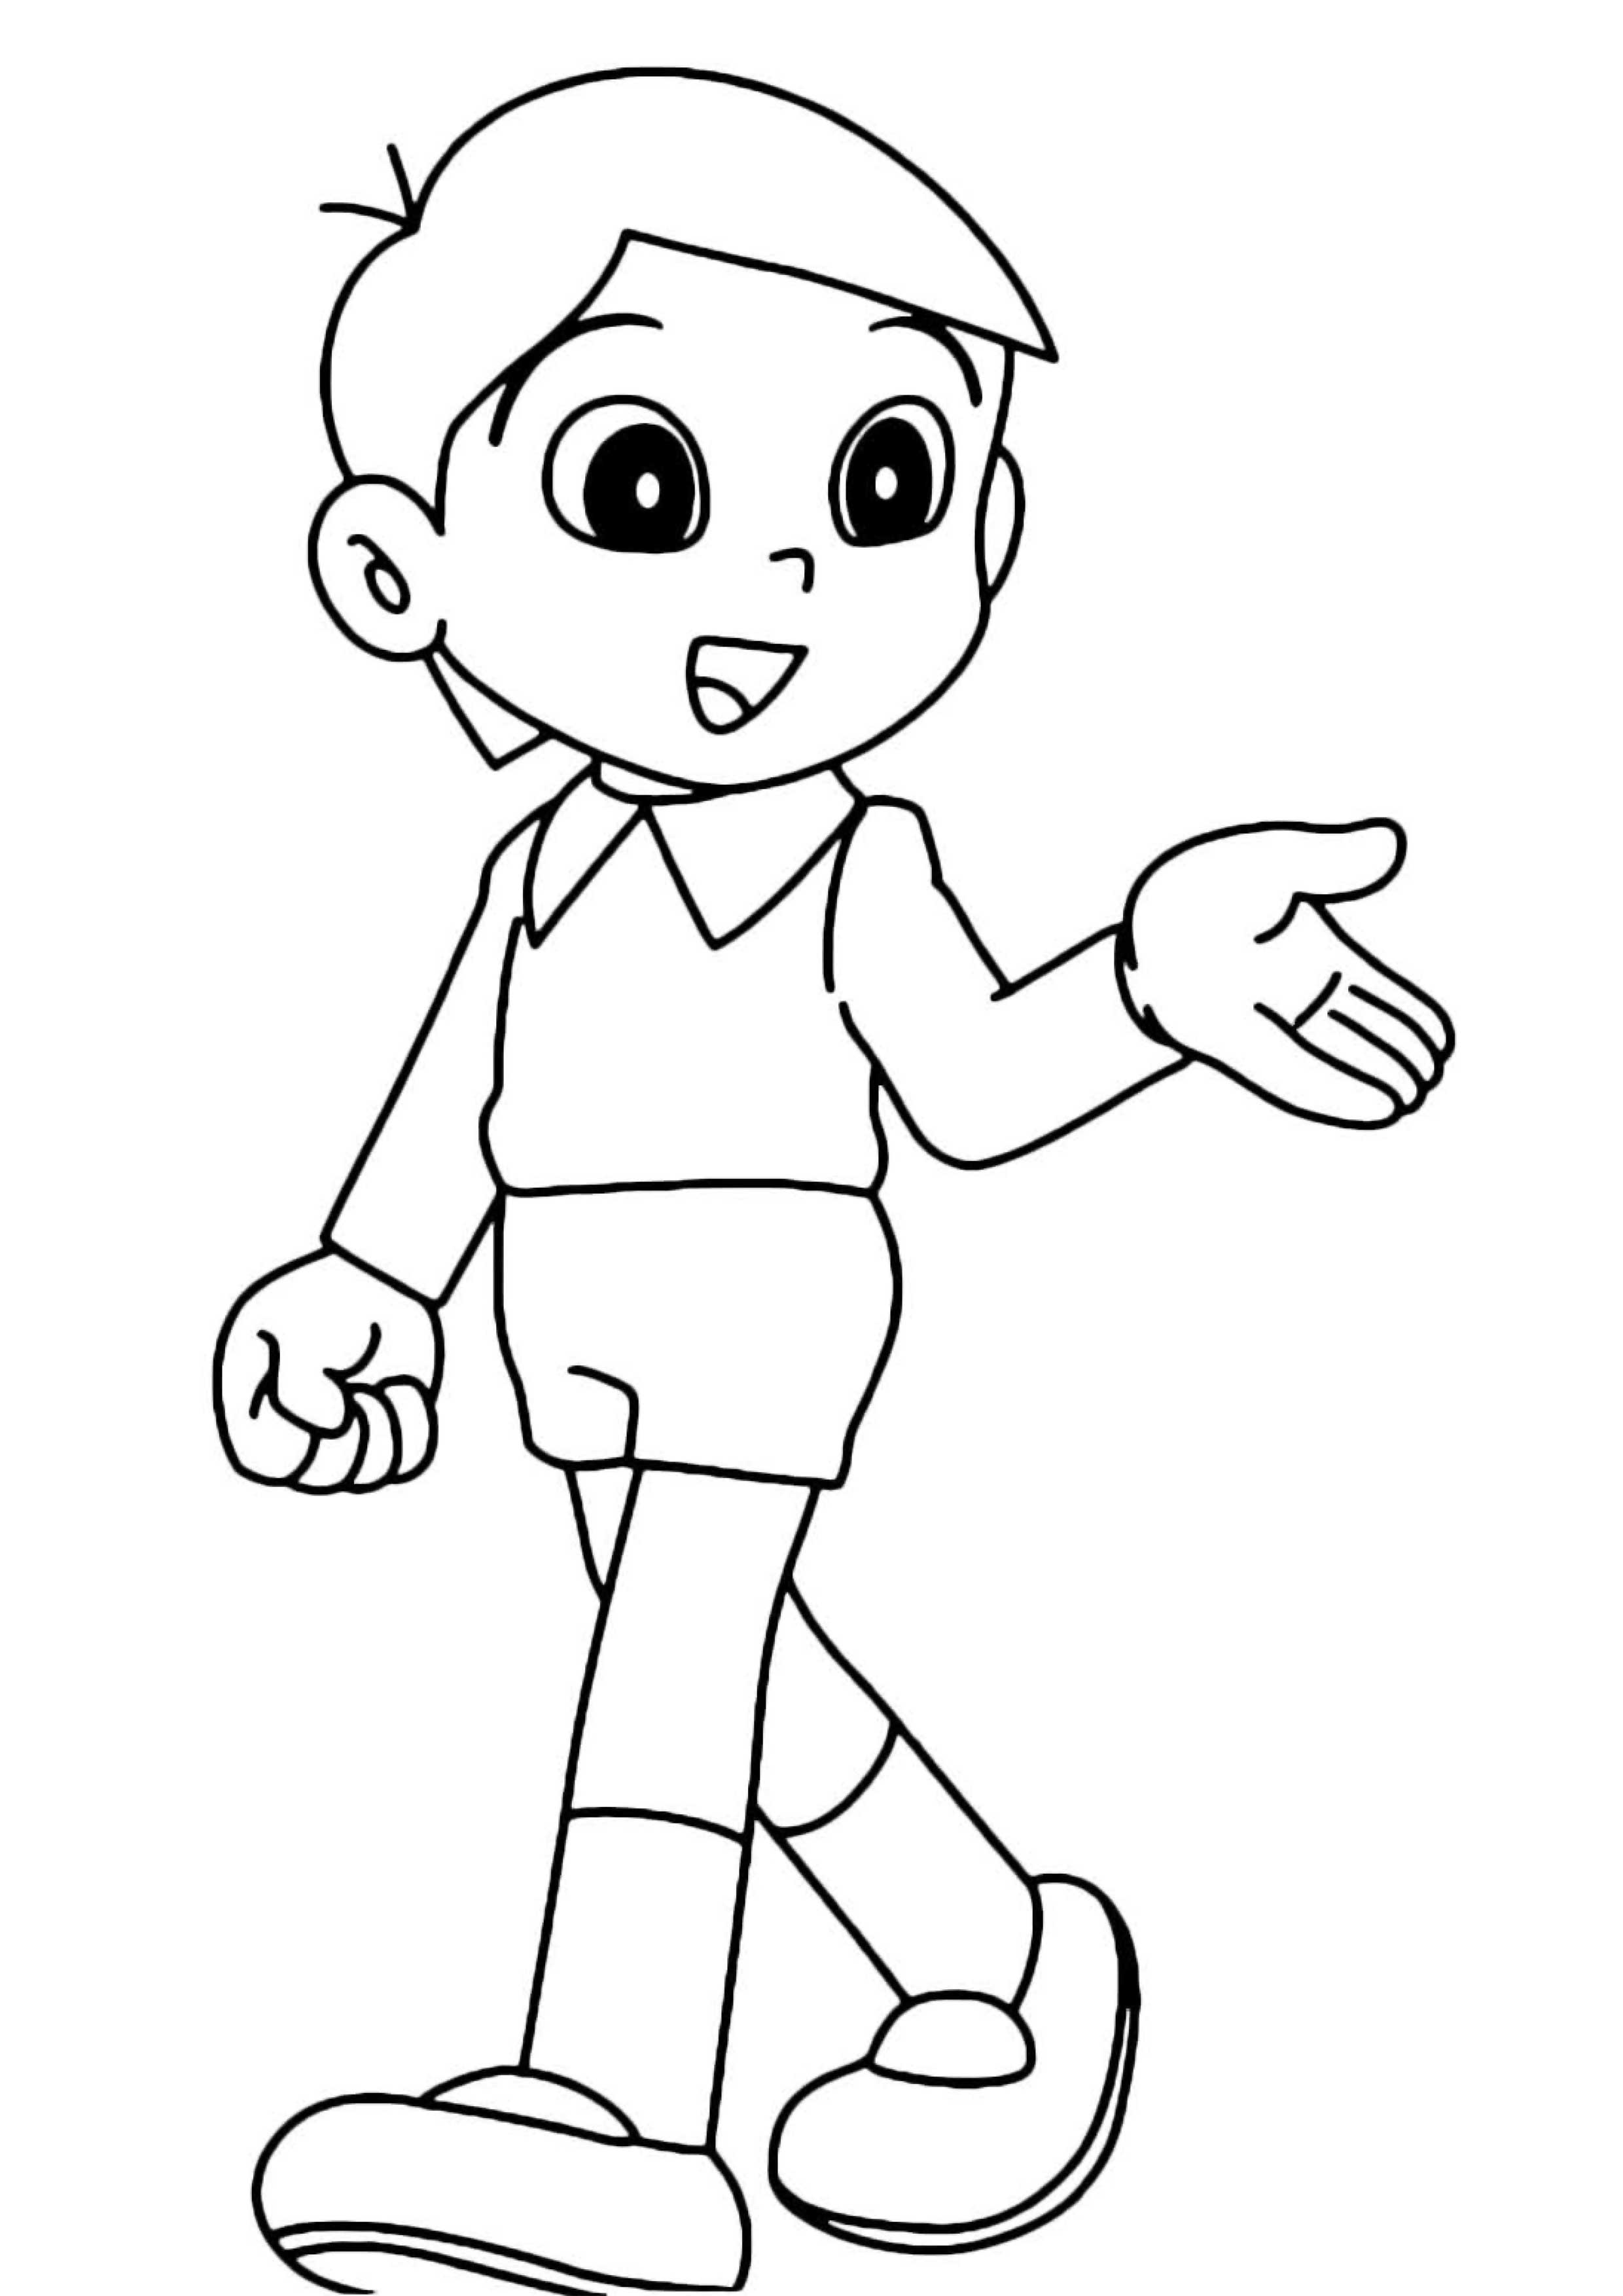 Doraemon-24